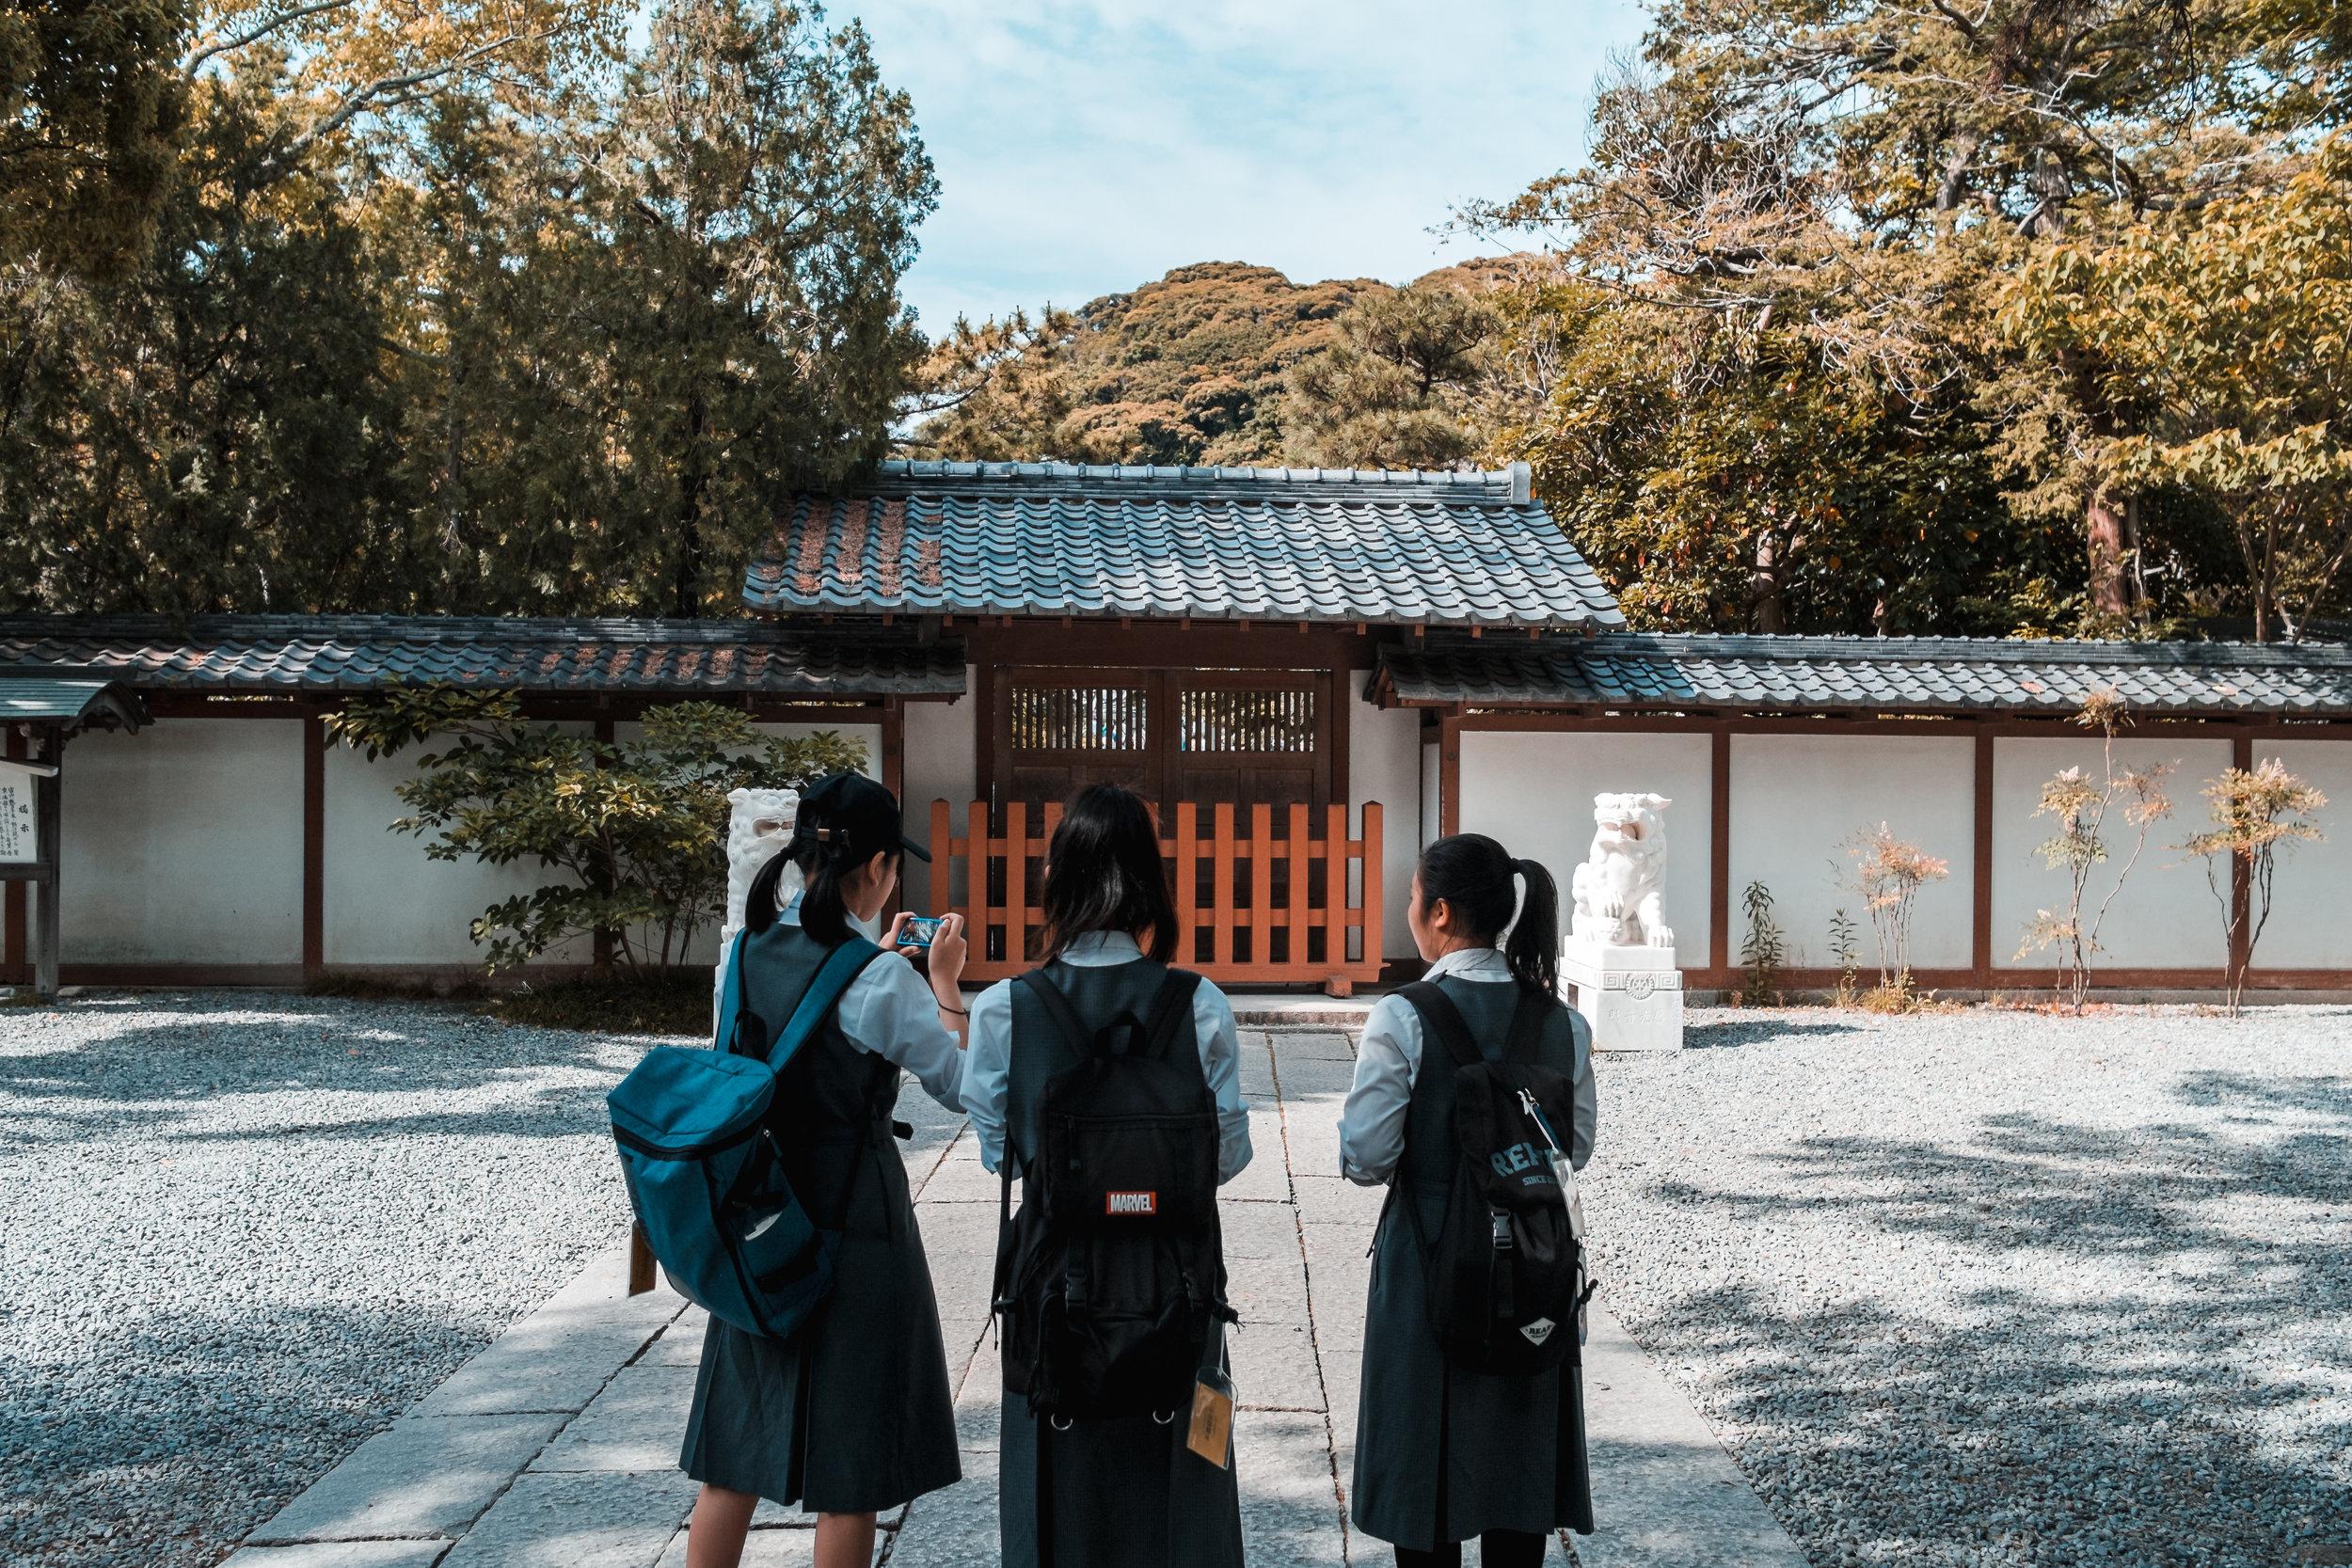 TokyoJapan_2018_AdamDillon_DSCF9521.jpg